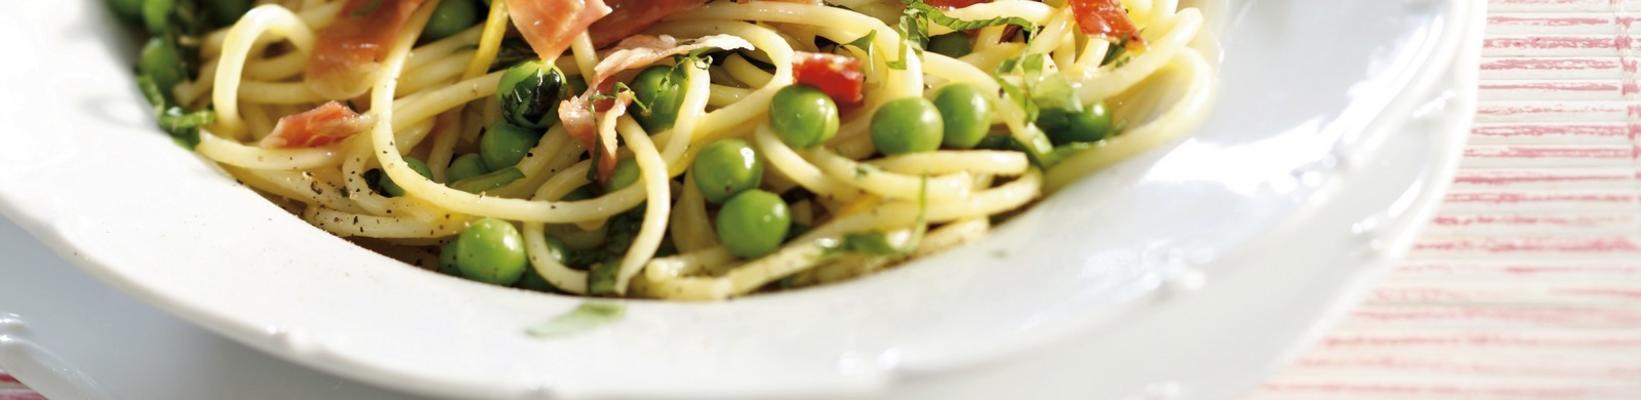 spaghetti with mint, peas, parsley, lemon and parma ham